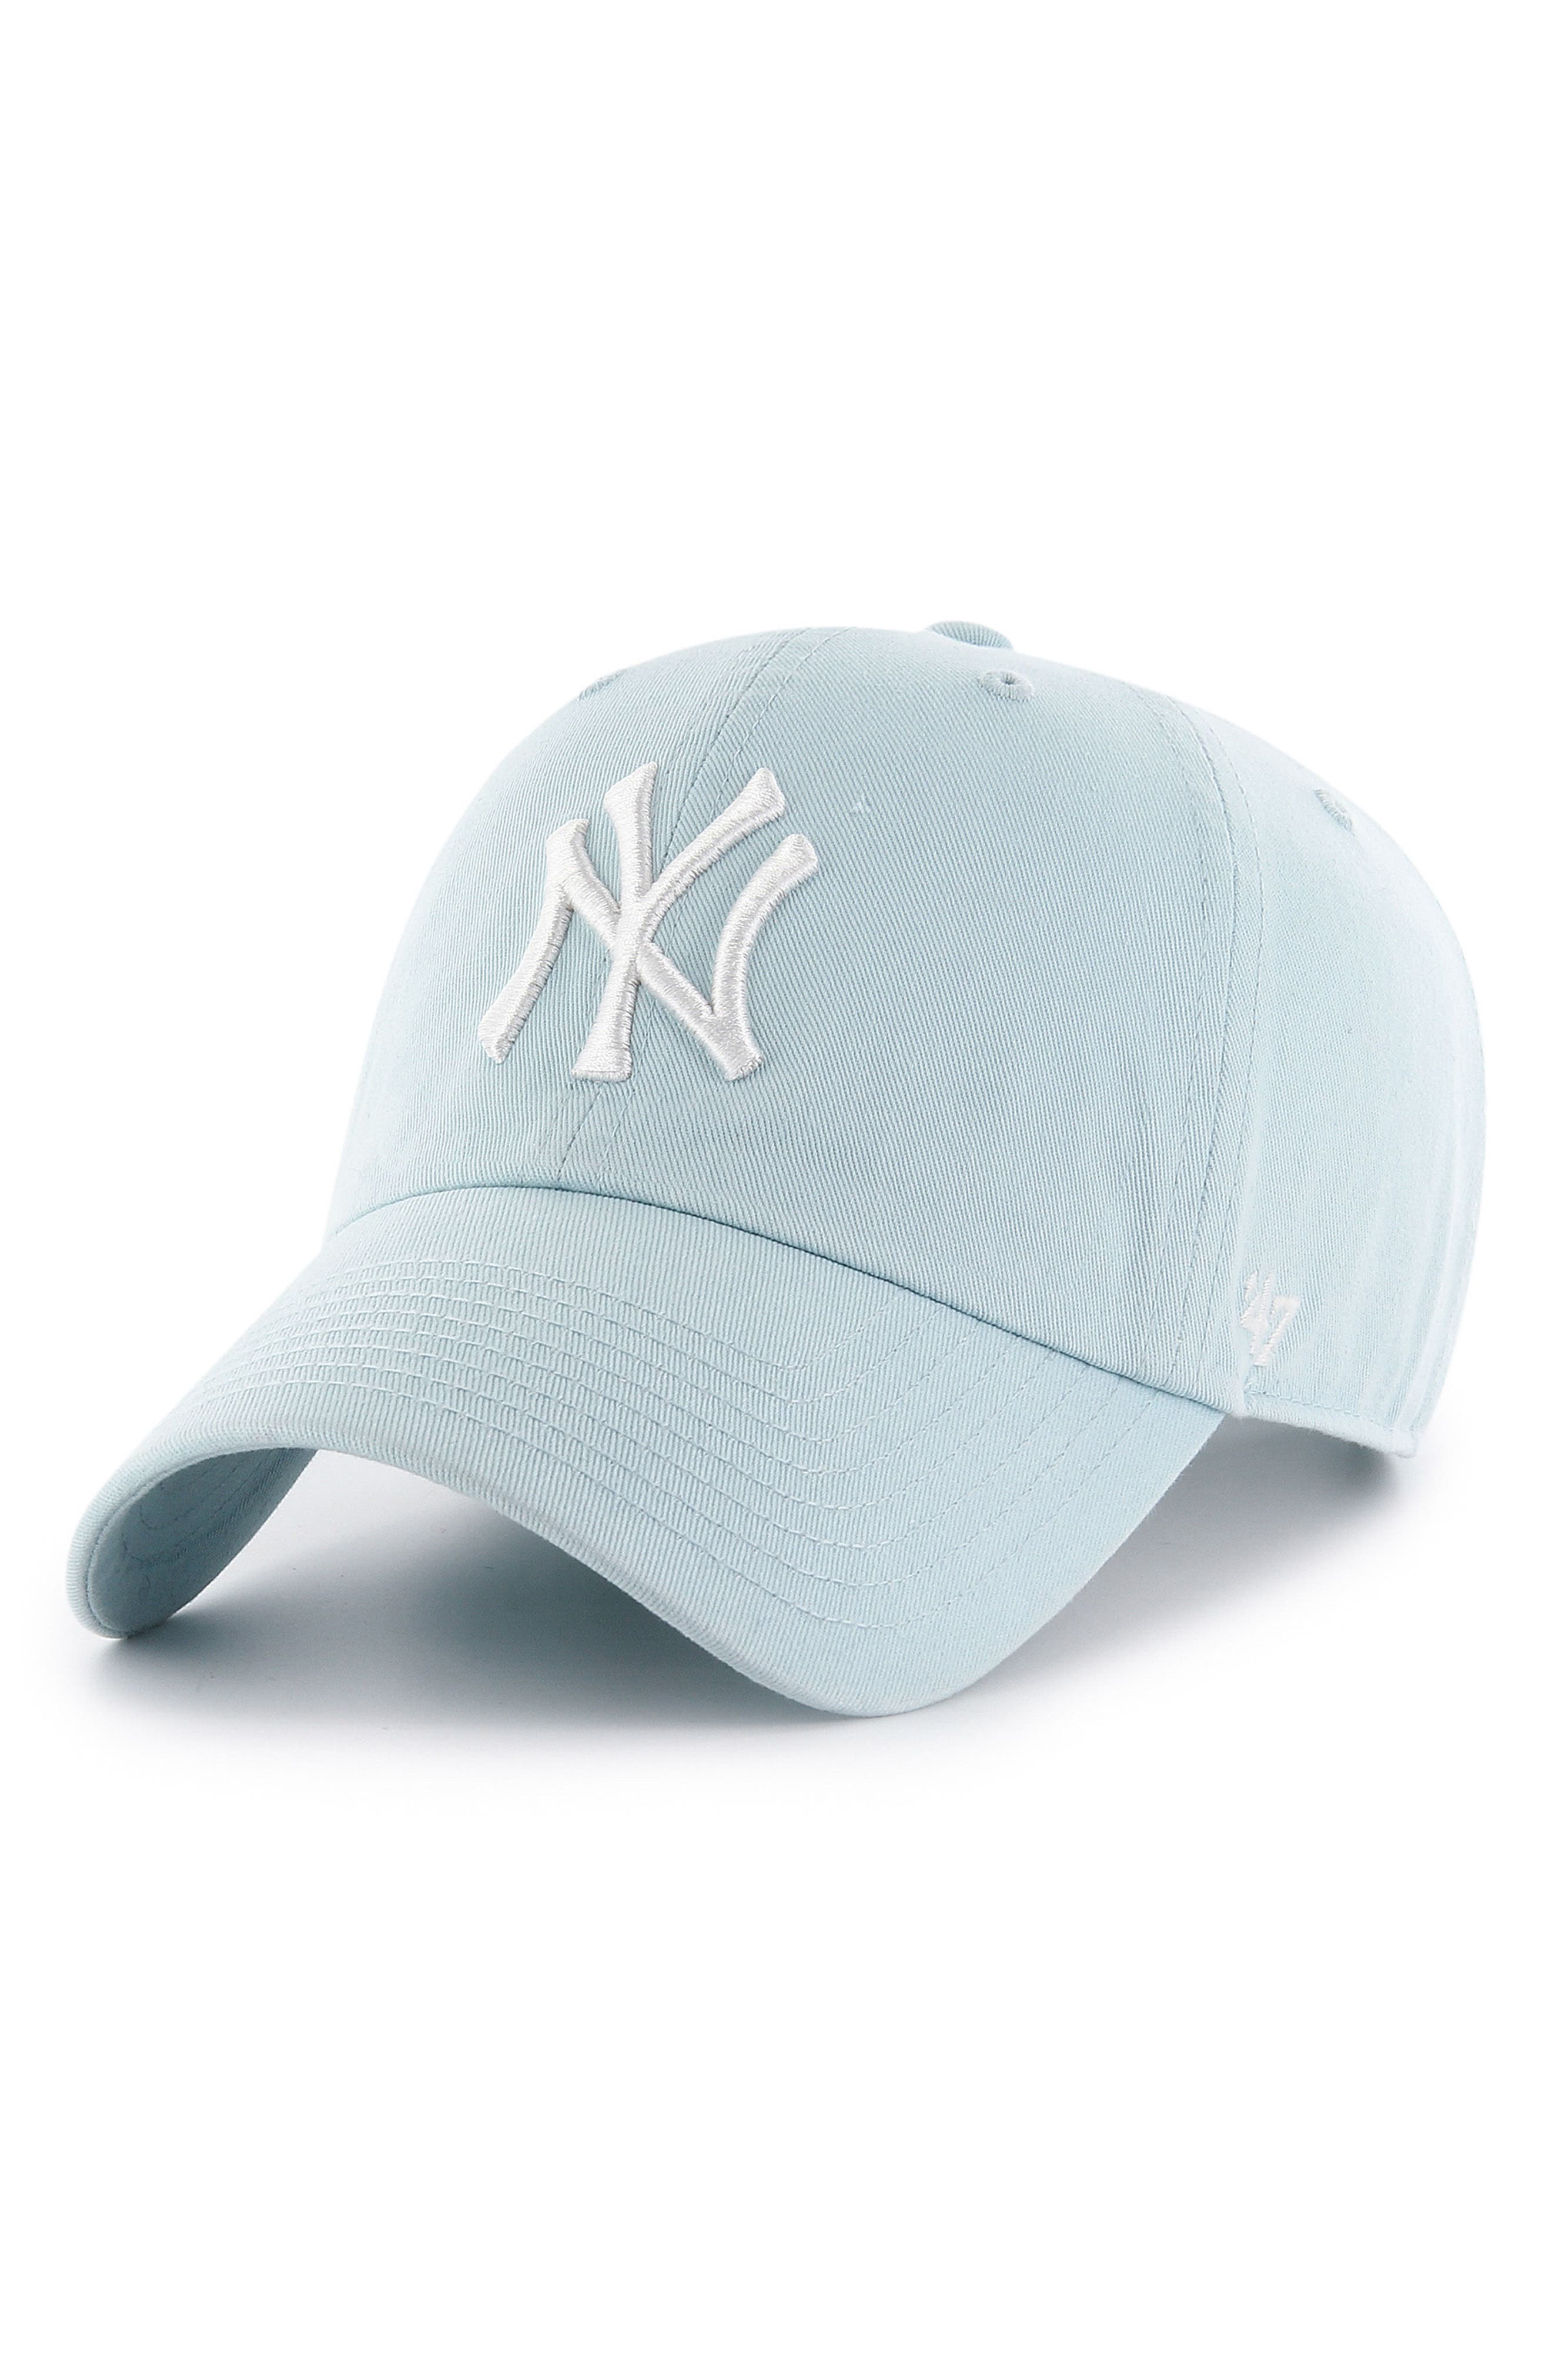 Alternate Image 1 Selected - '47 NY Yankees Baseball Cap